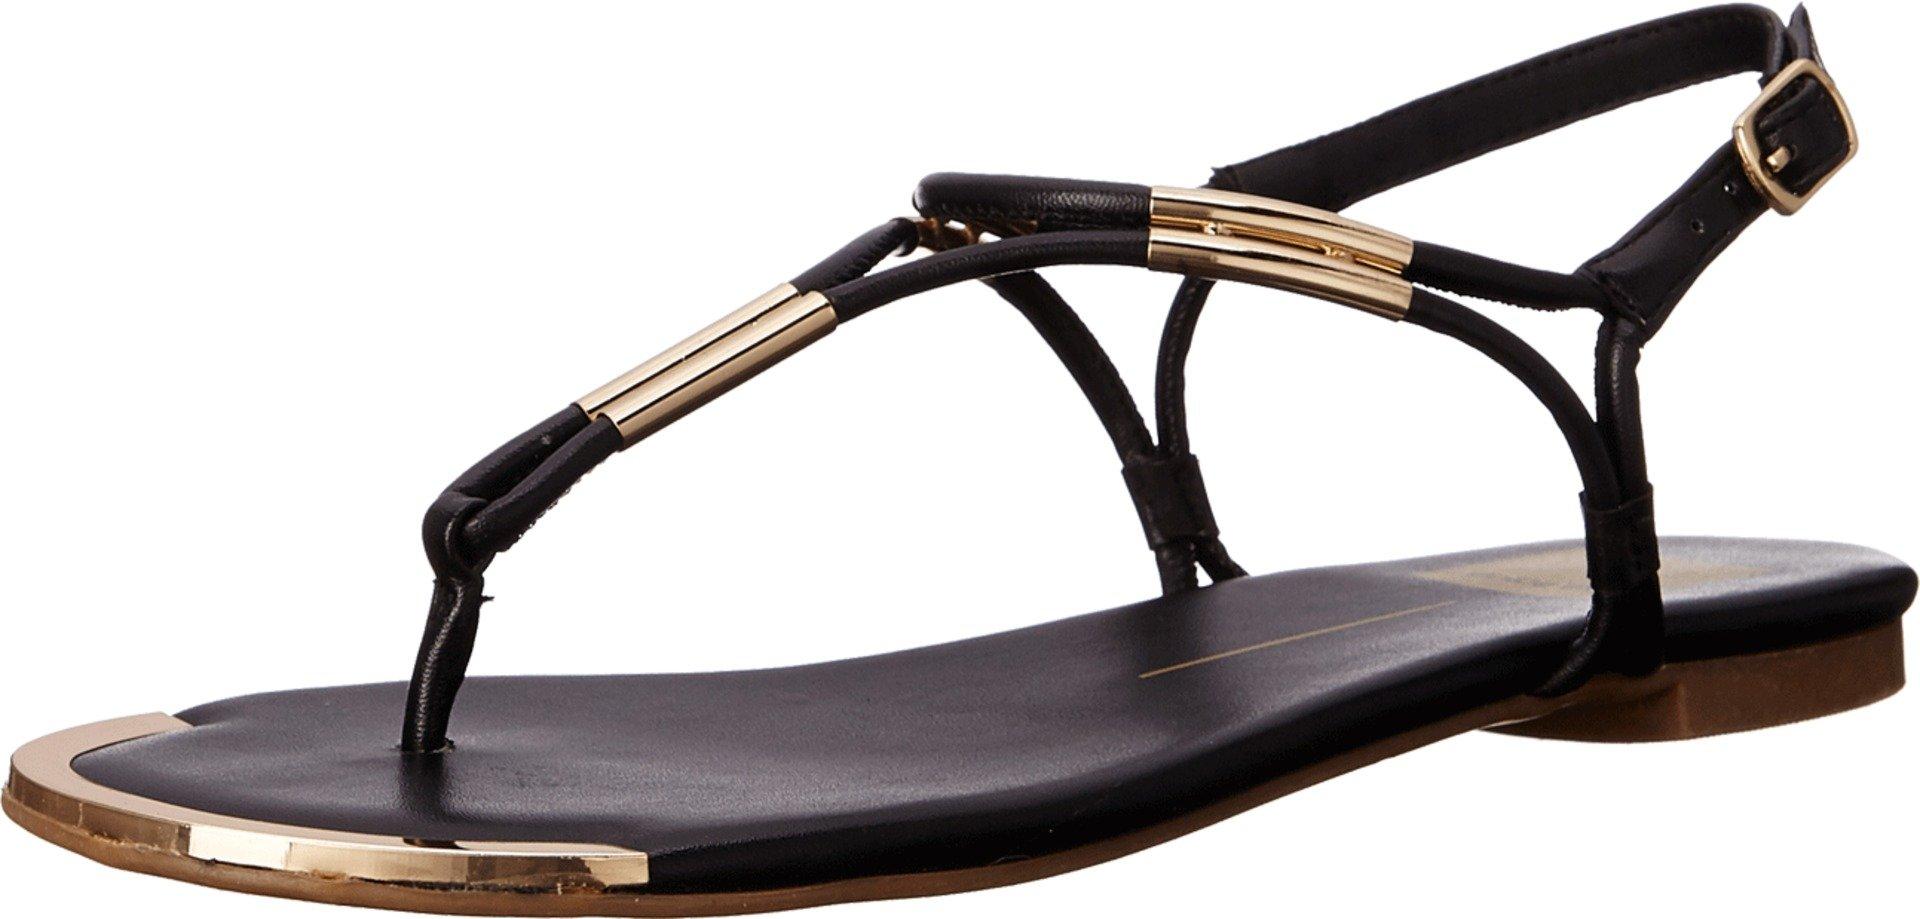 Dolce Vita Women's Marly Flat Sandal,Black,8.5 B(M) US by Dolce Vita